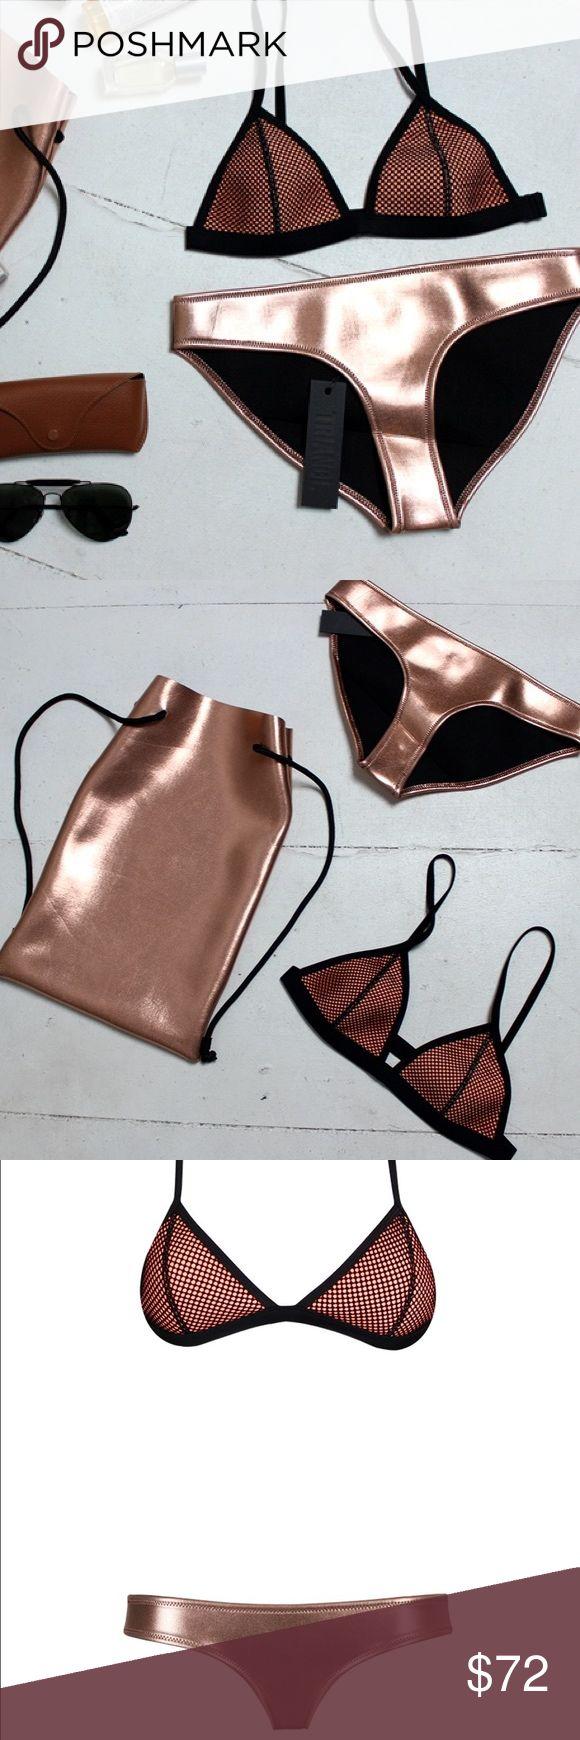 OLLIE Triangl bikini!! READ DESCRIPTION Brand new Triangl bikini in gold! Selling for a friend so it's not in stock yet. Both top and bottom are size small. triangl swimwear Swim Bikinis